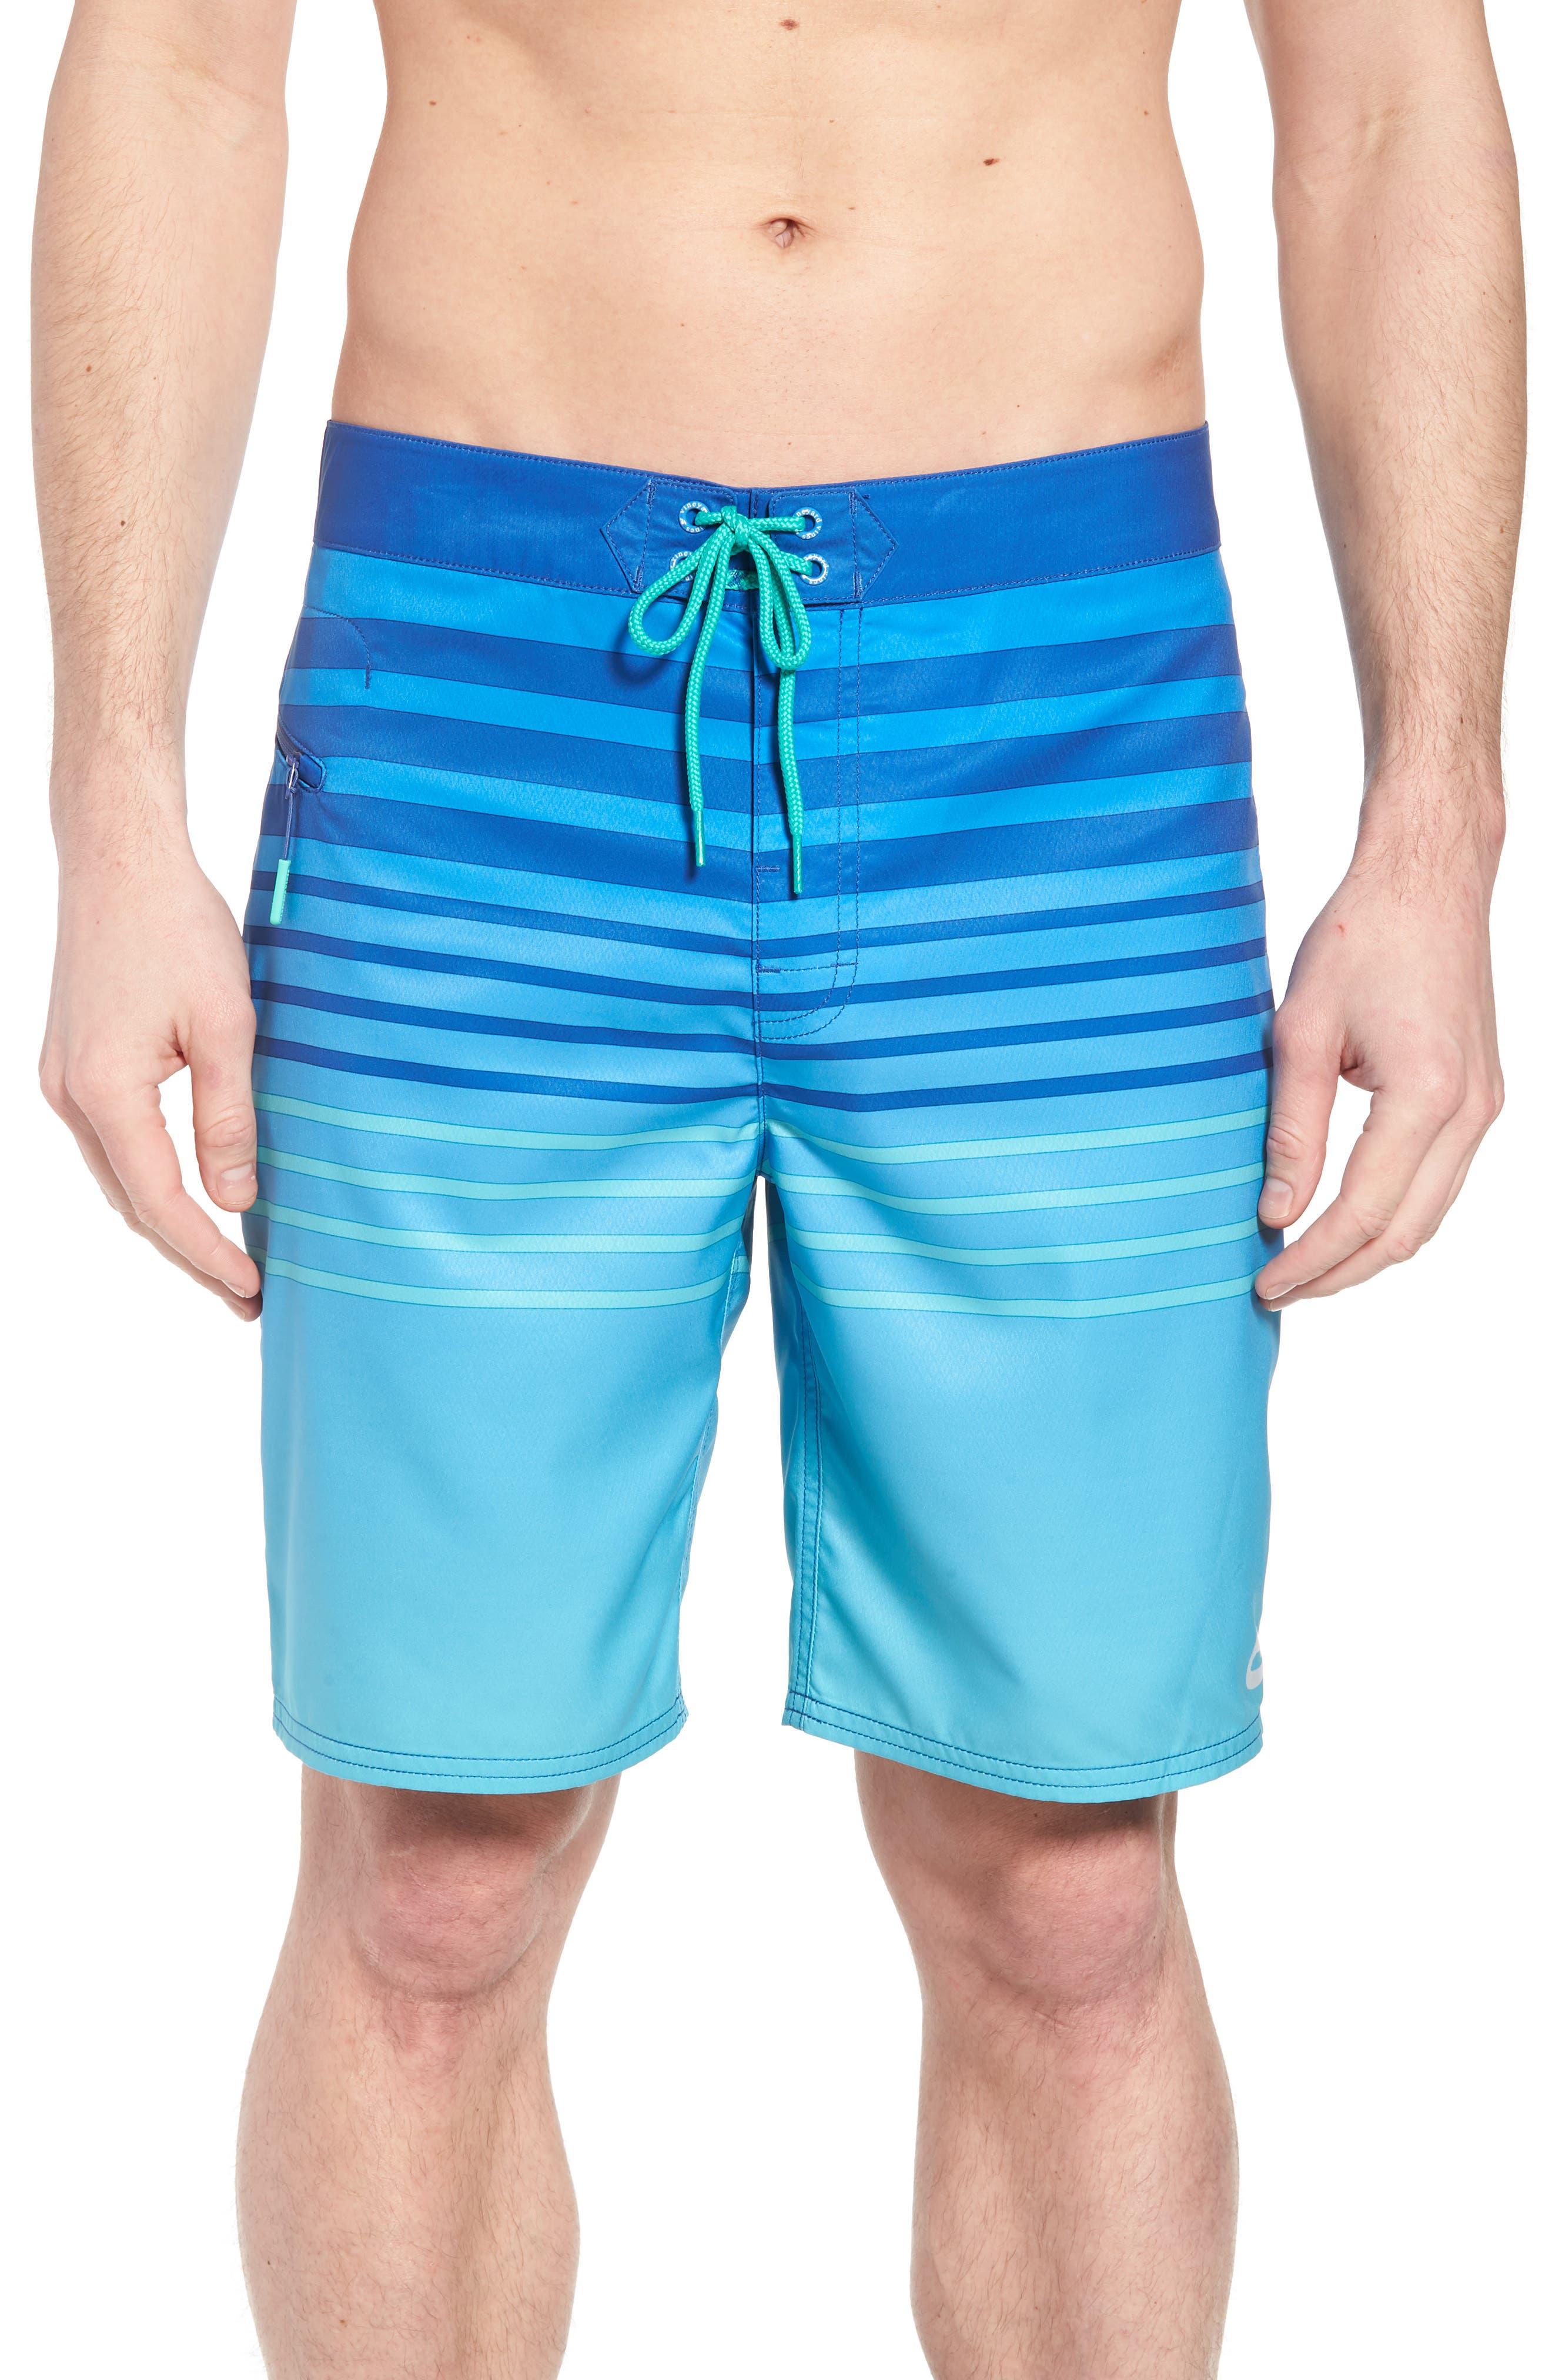 Surflodge Stripe Board Shorts,                         Main,                         color, 359